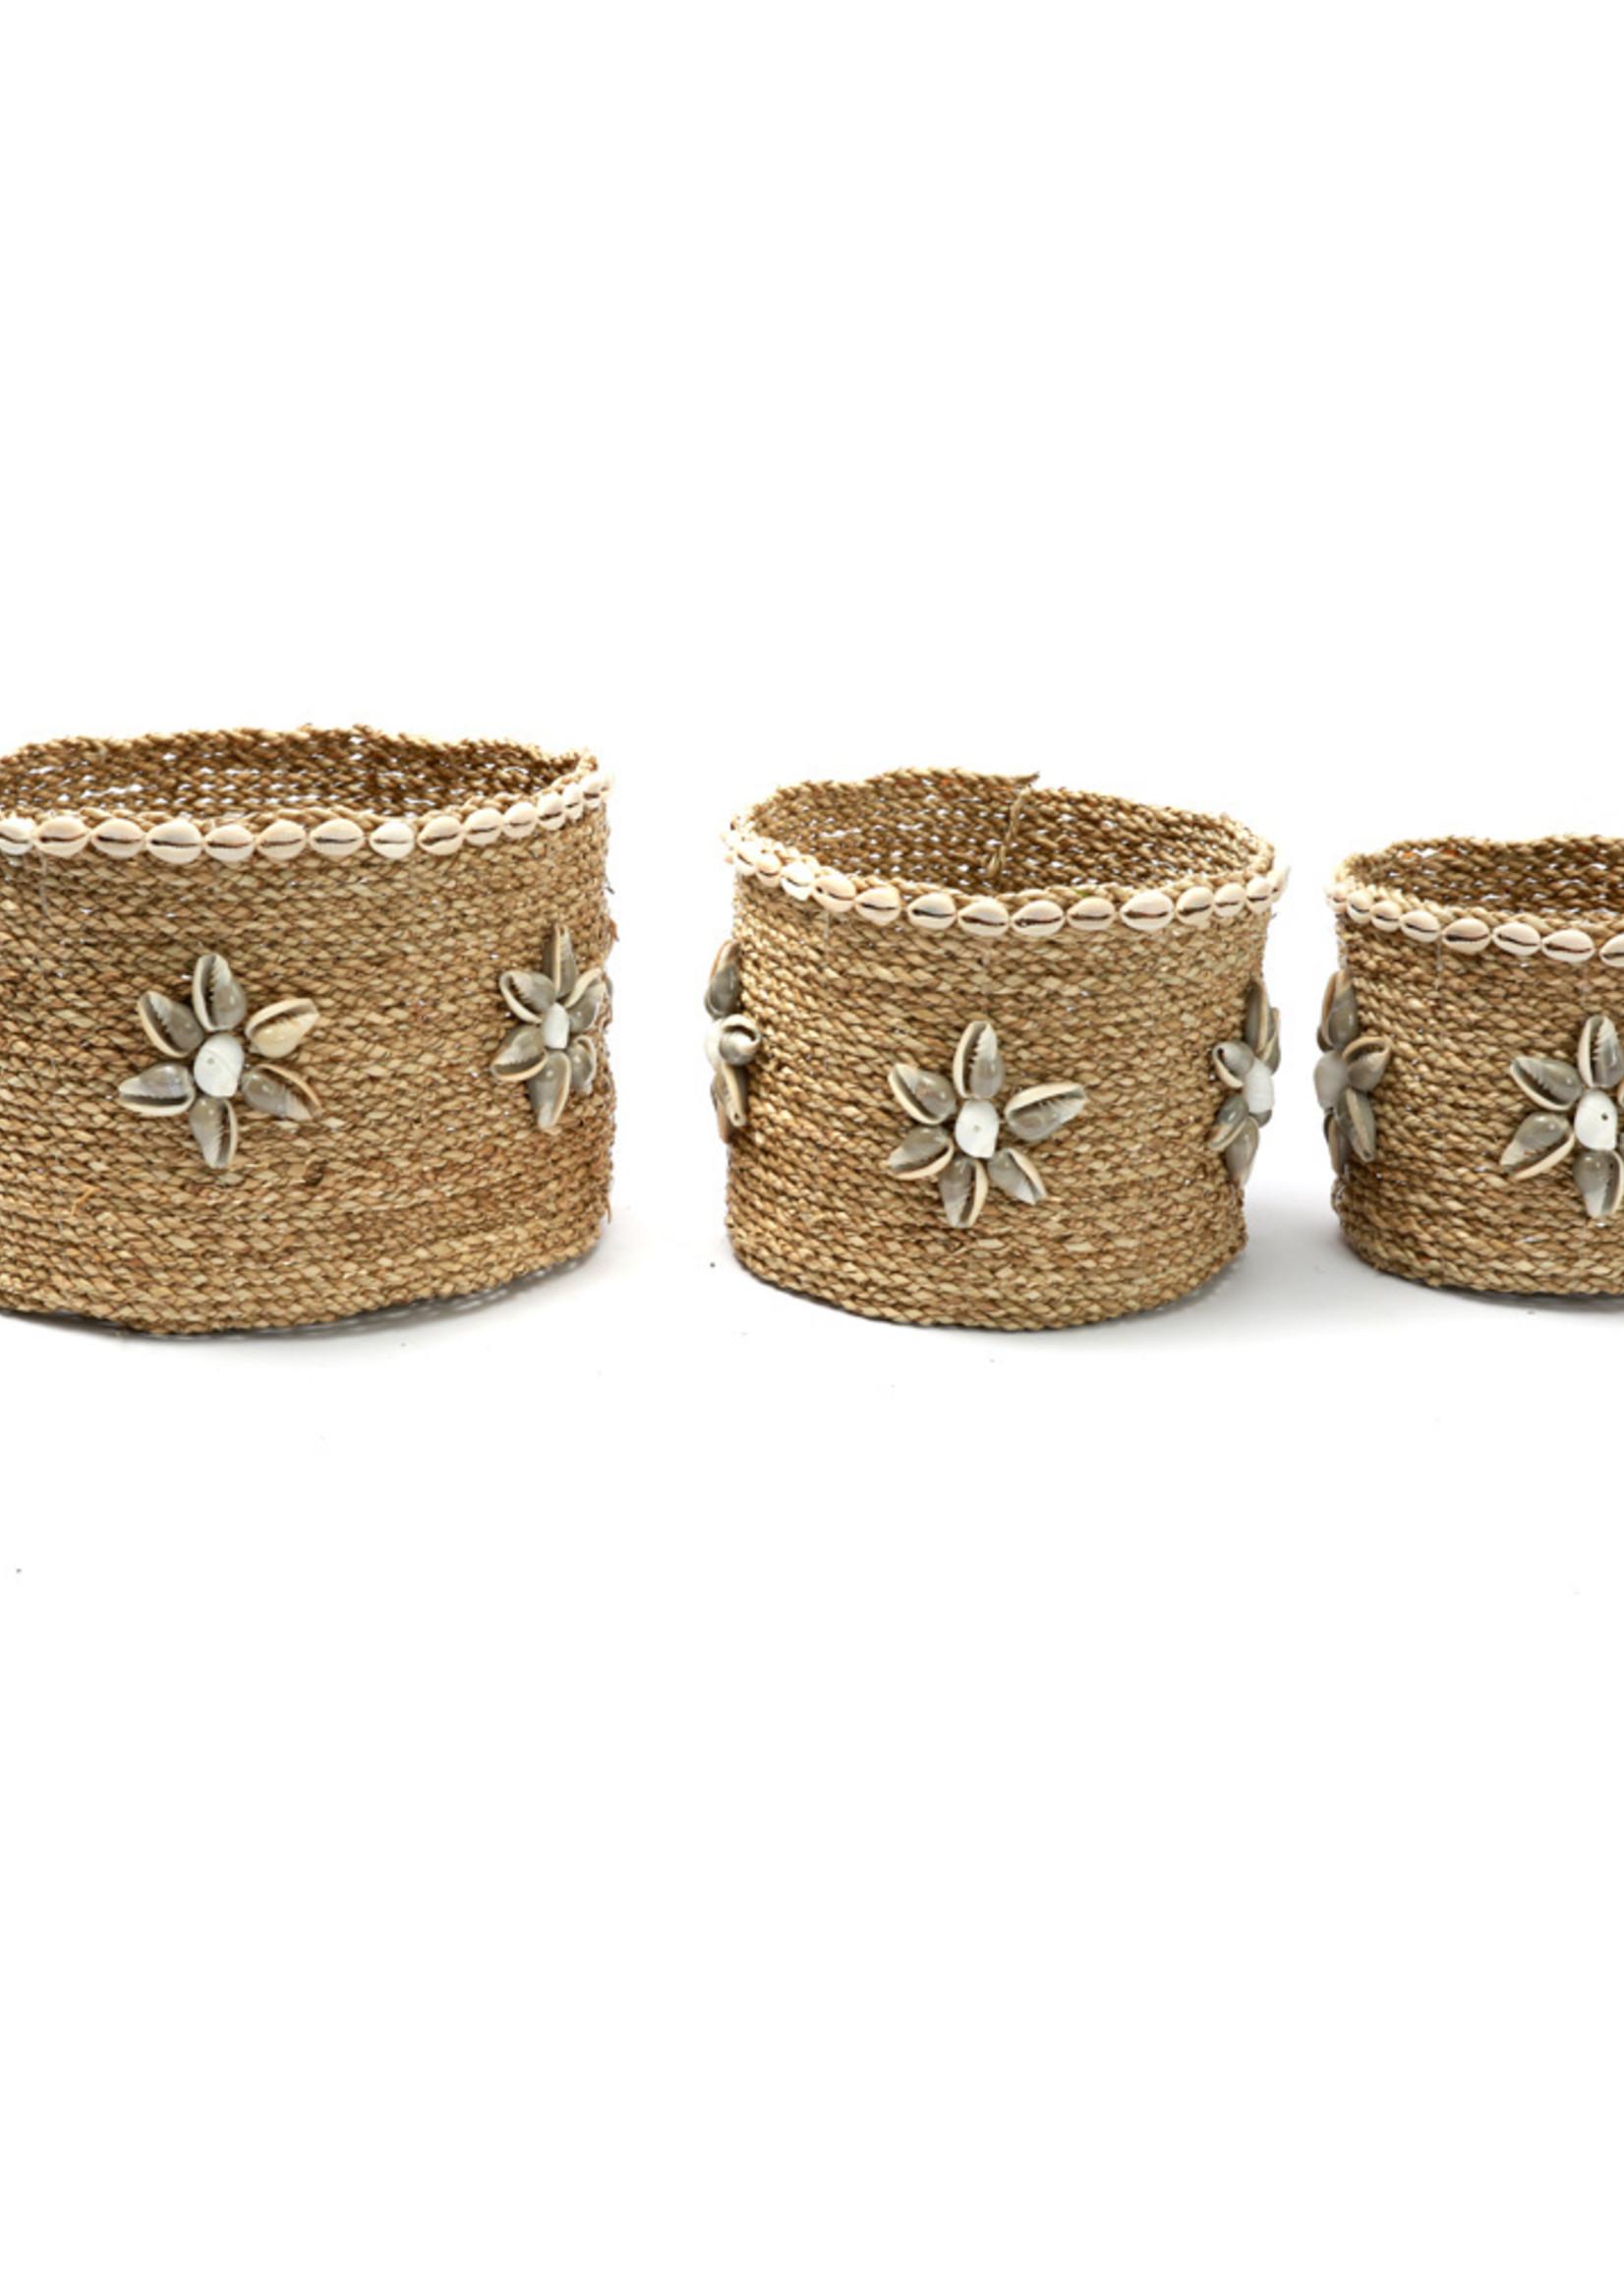 The Beach View Baskets - Natural - SET3